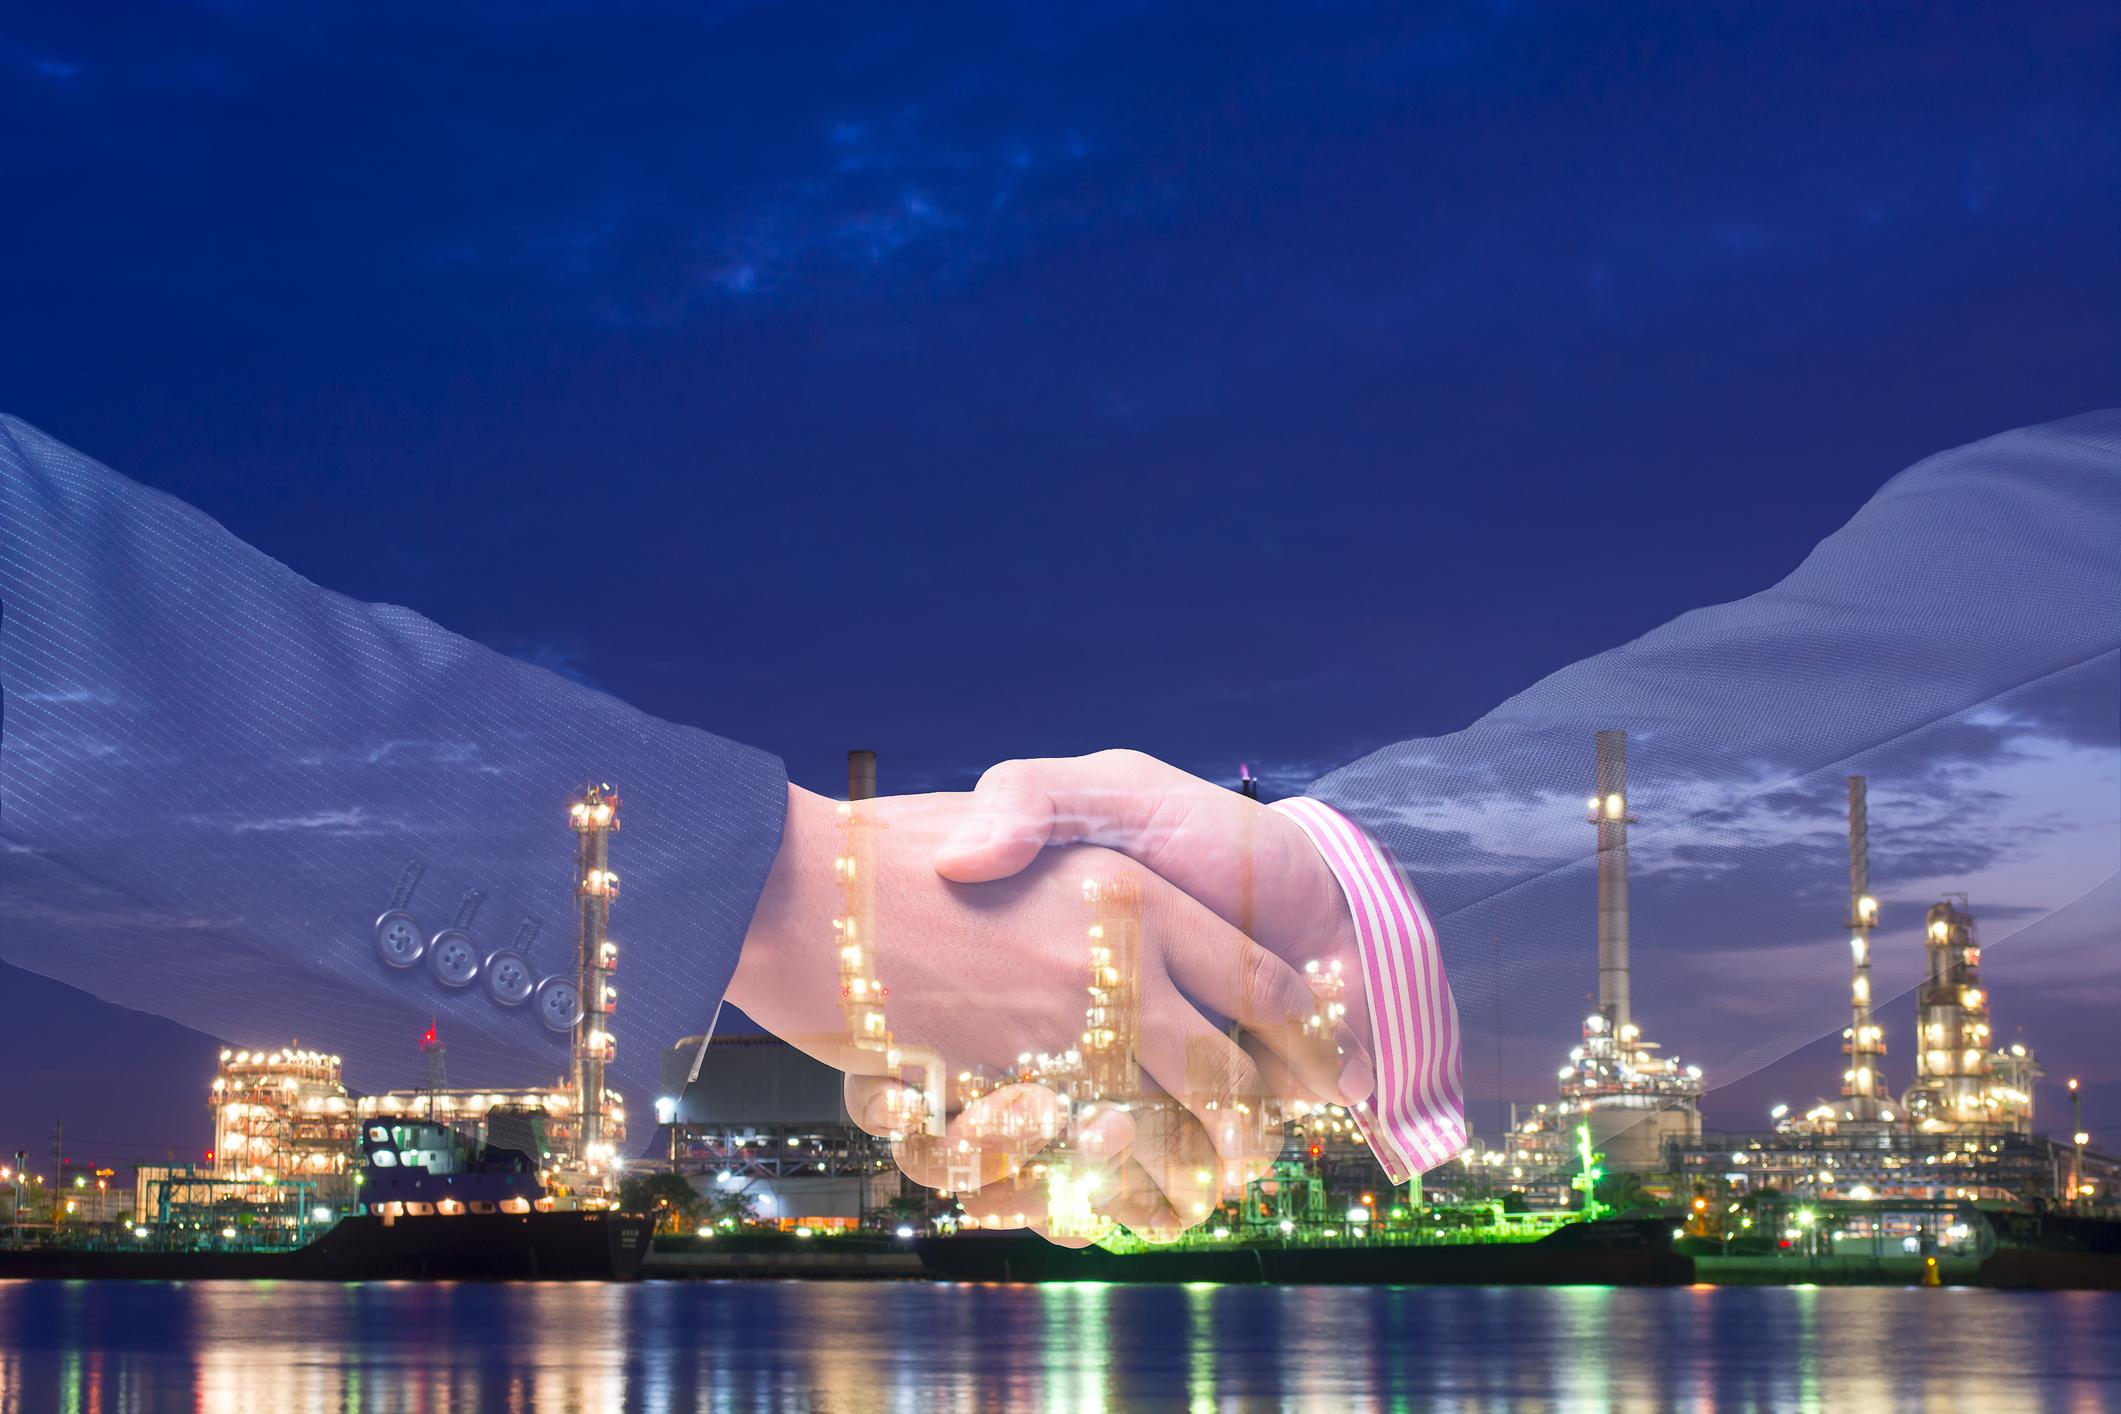 Double exposure of handshake and energy plant.